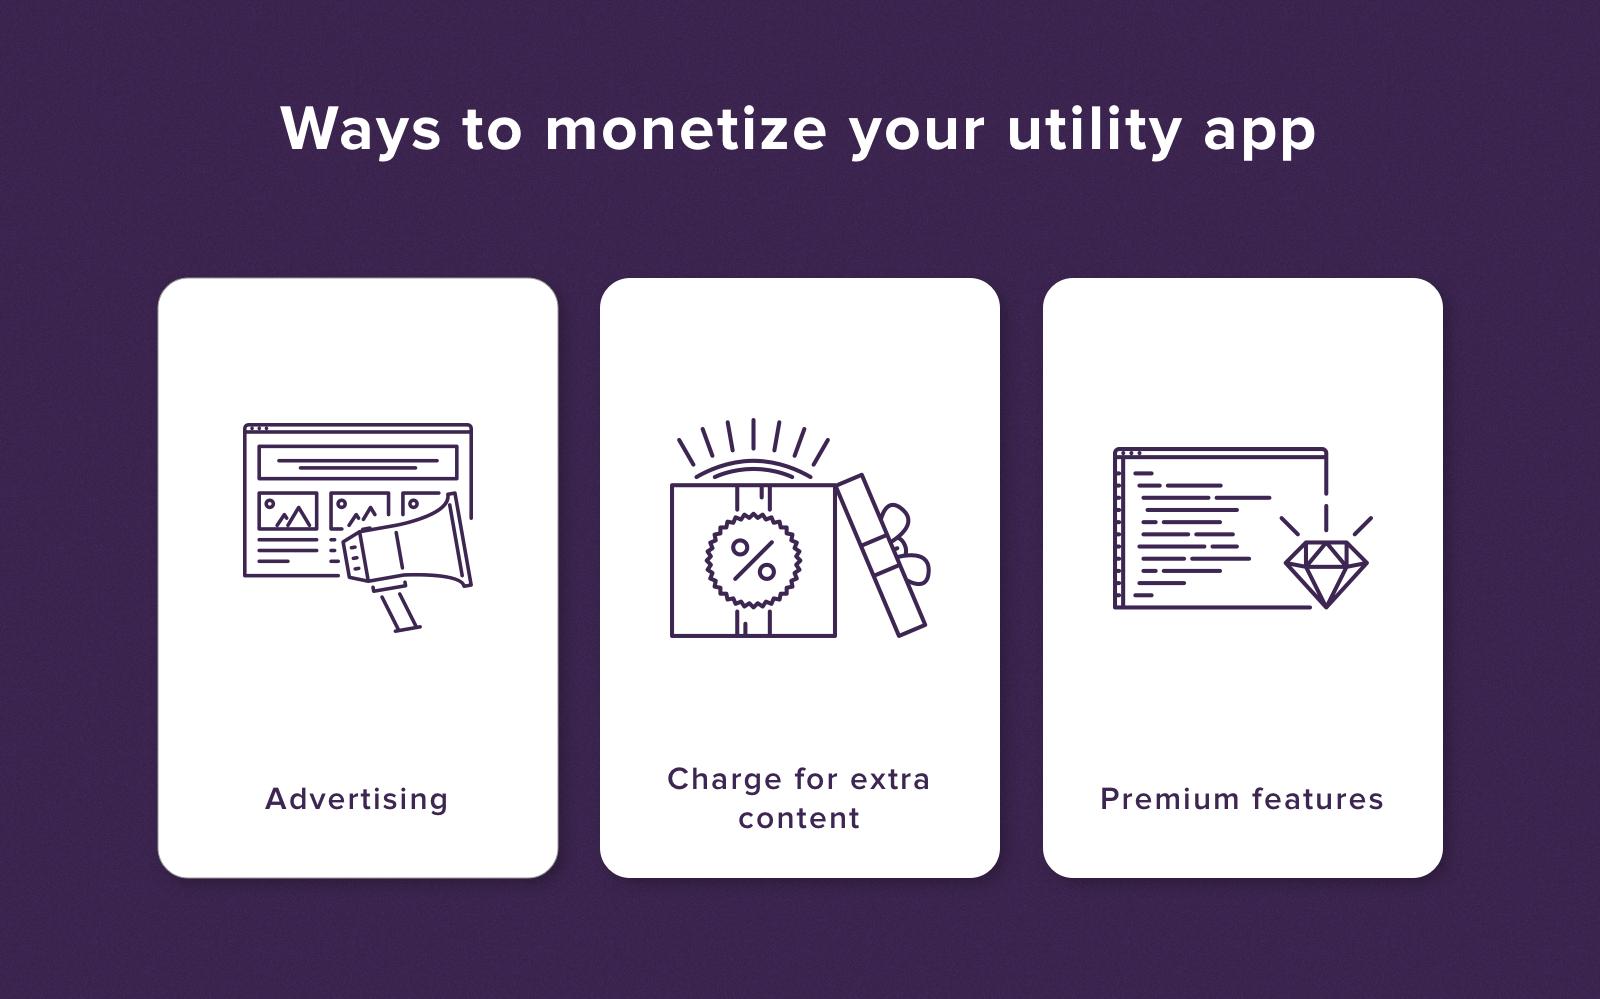 Utility app monetization